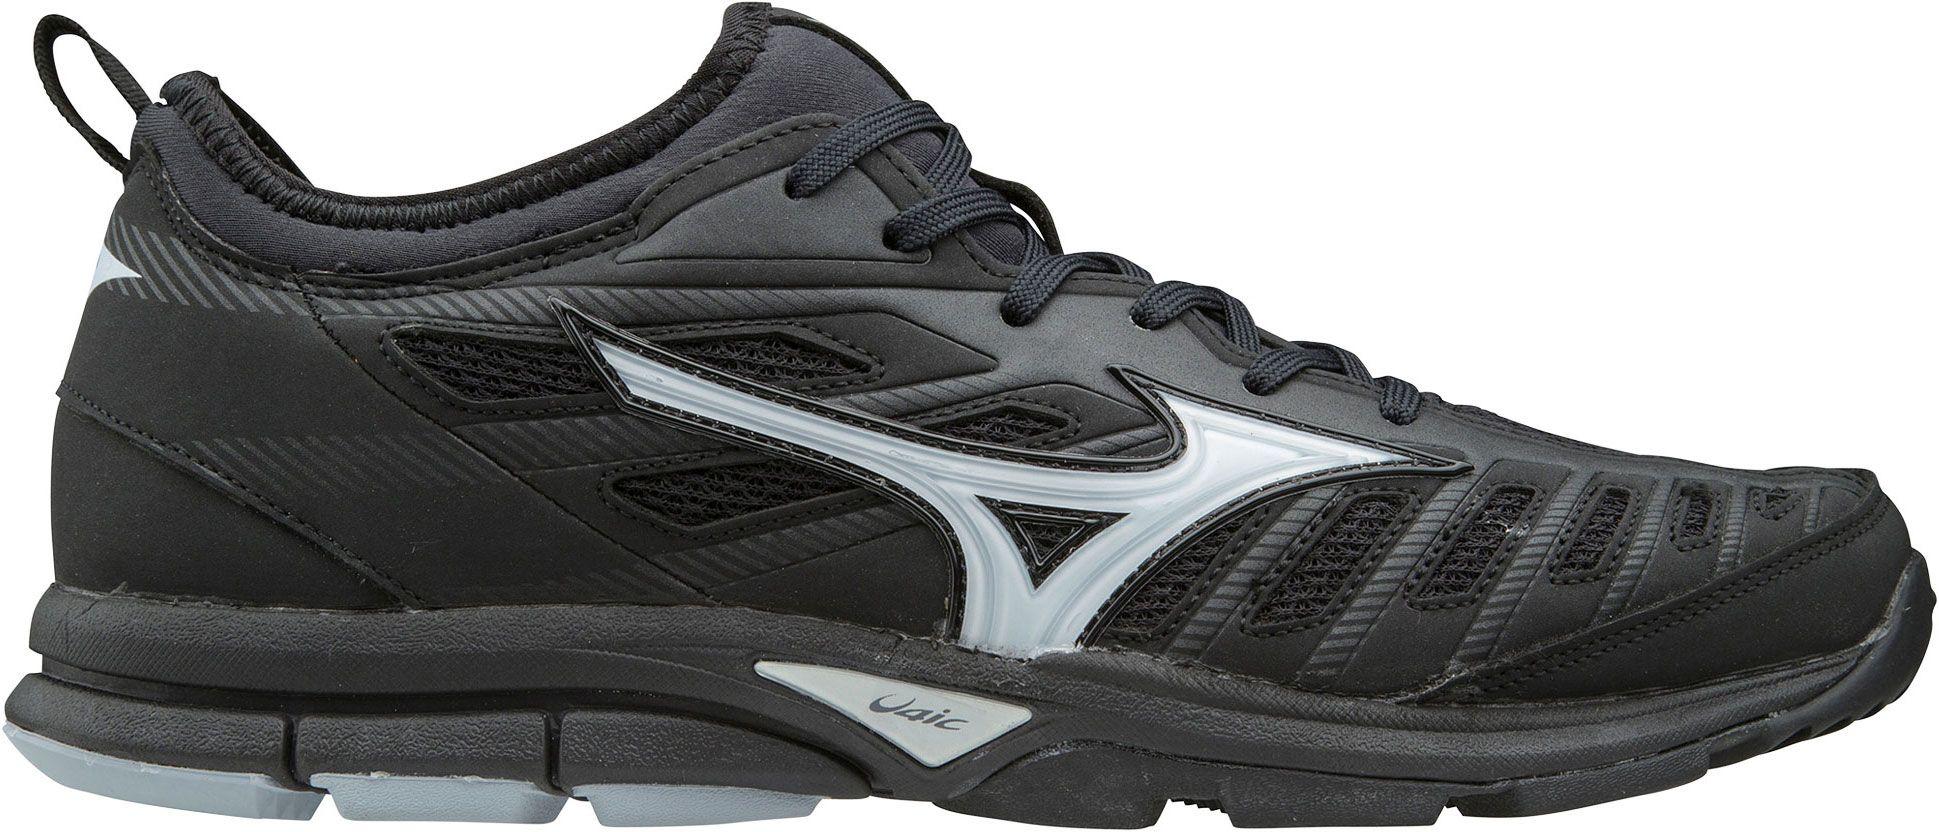 mizuno men's running shoes size 9 youth gsmarena size normal